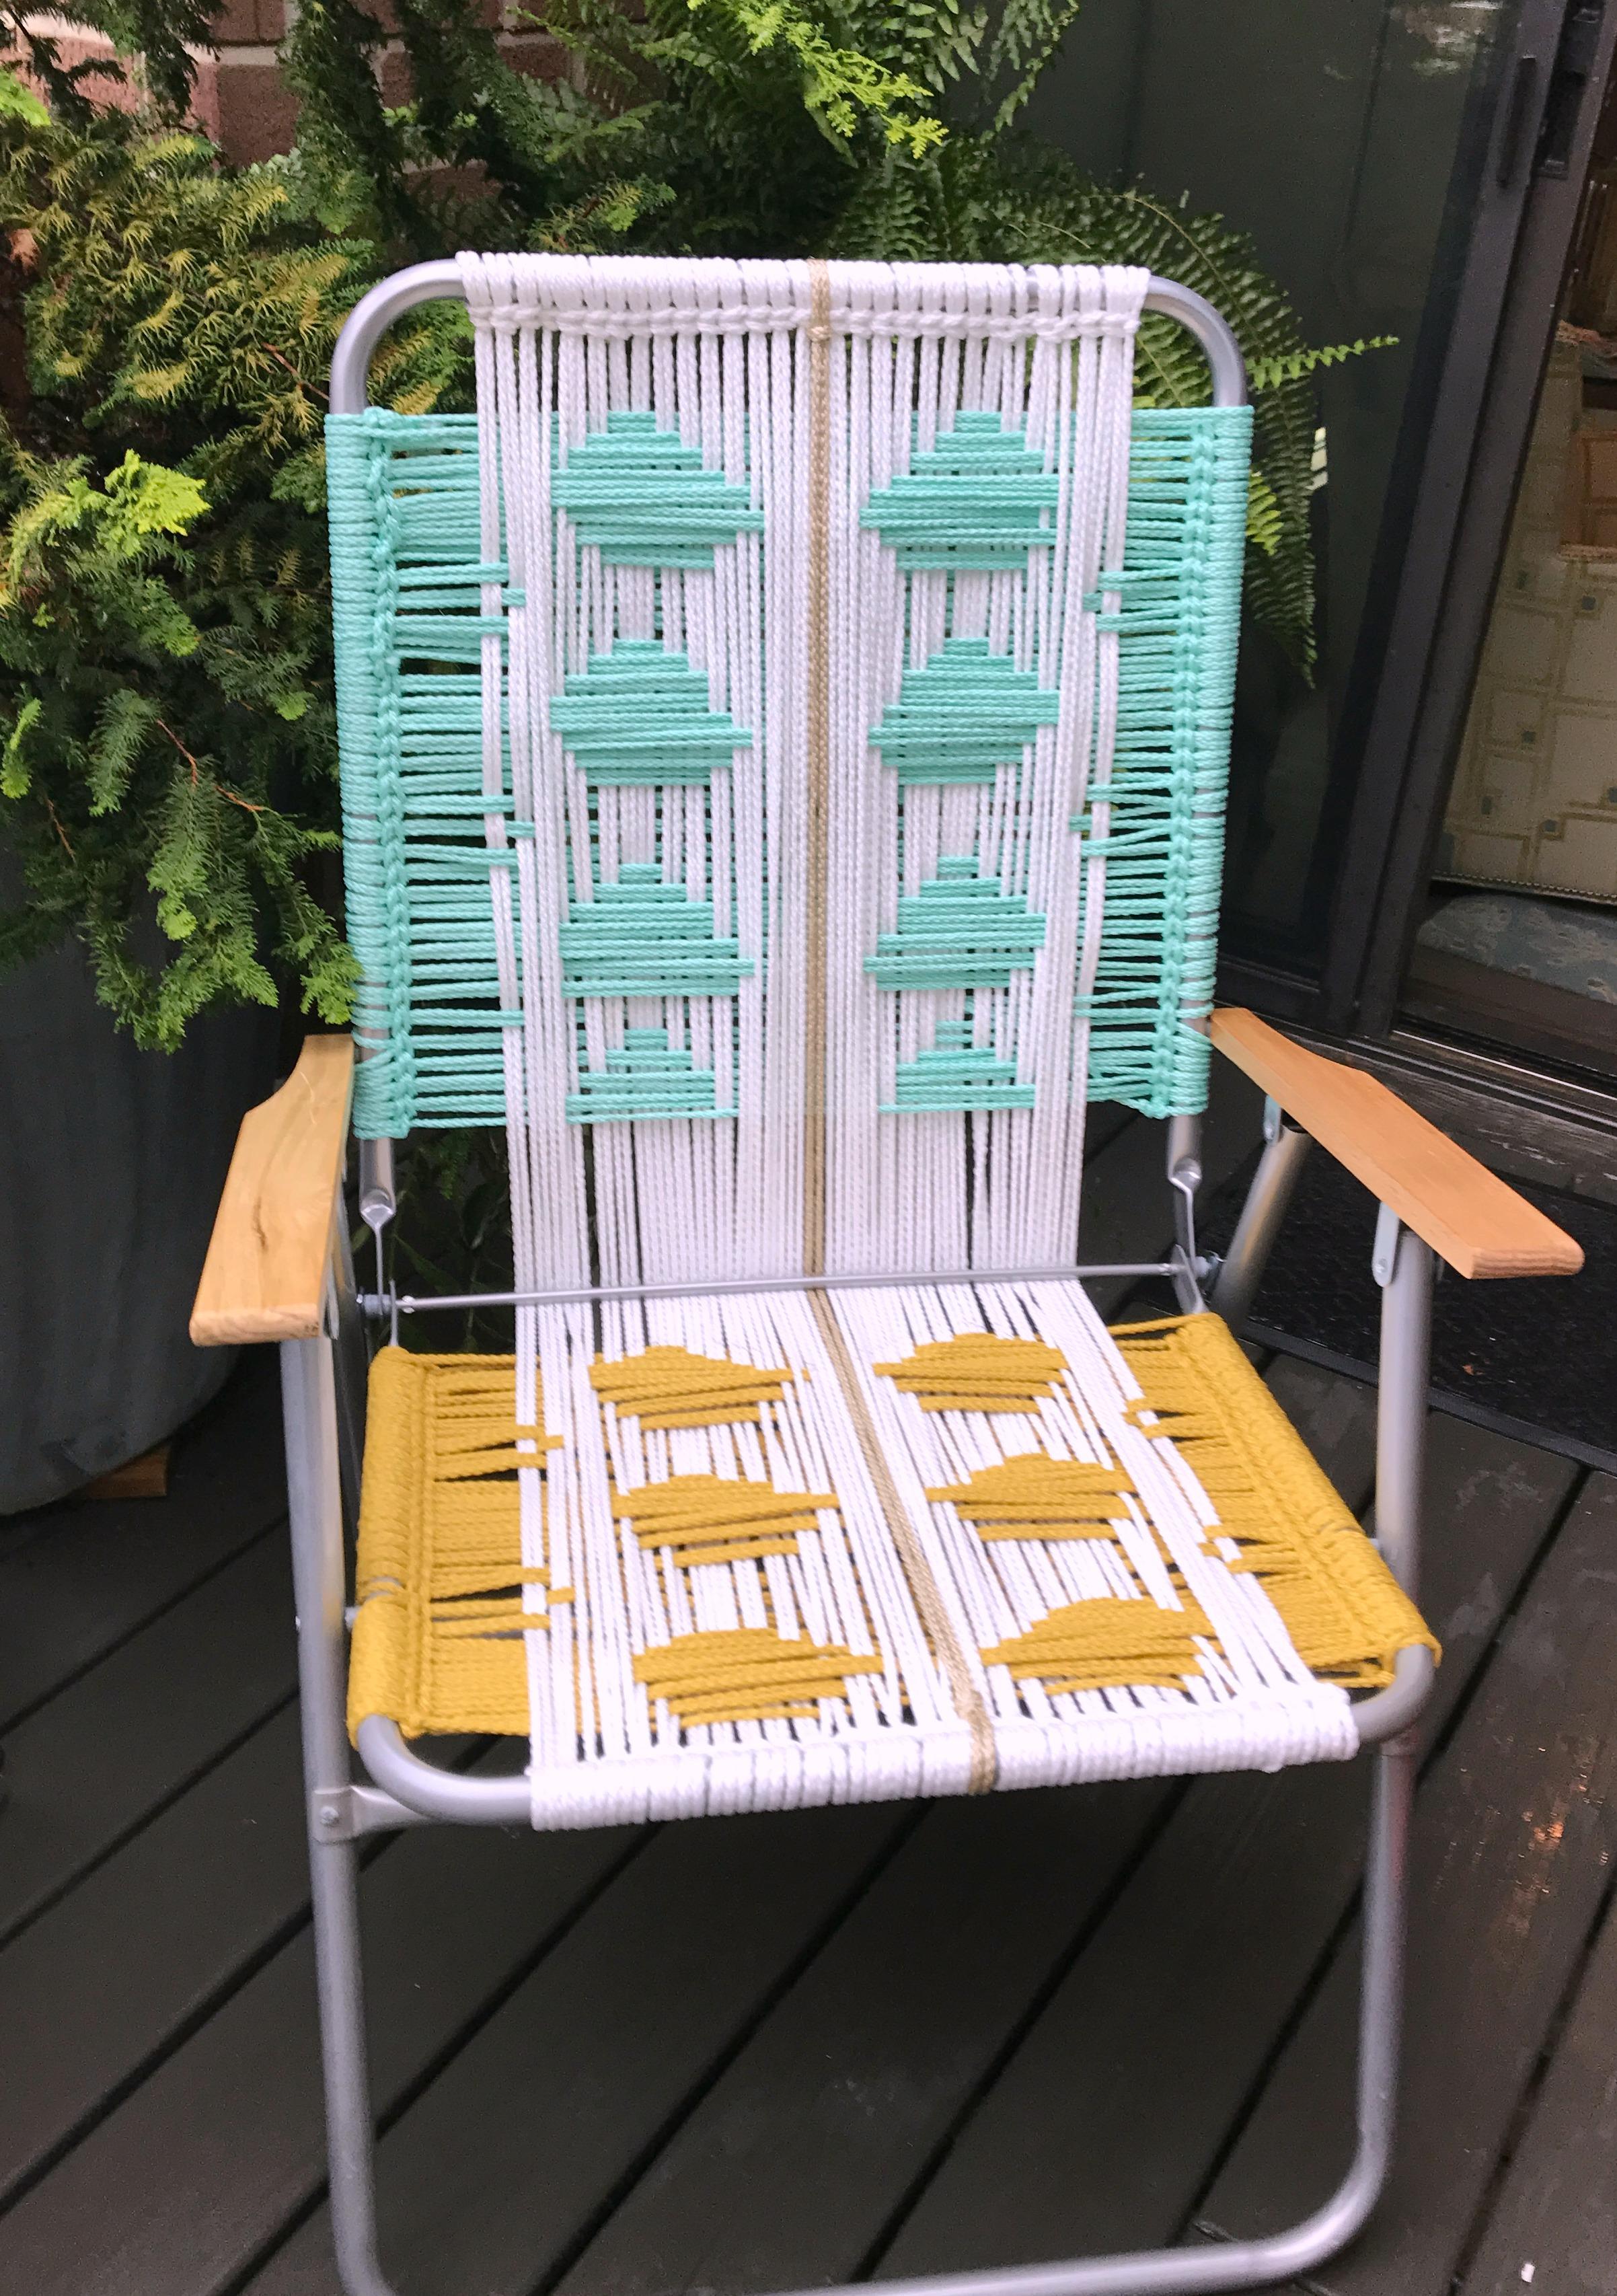 Macrame chair back patterns